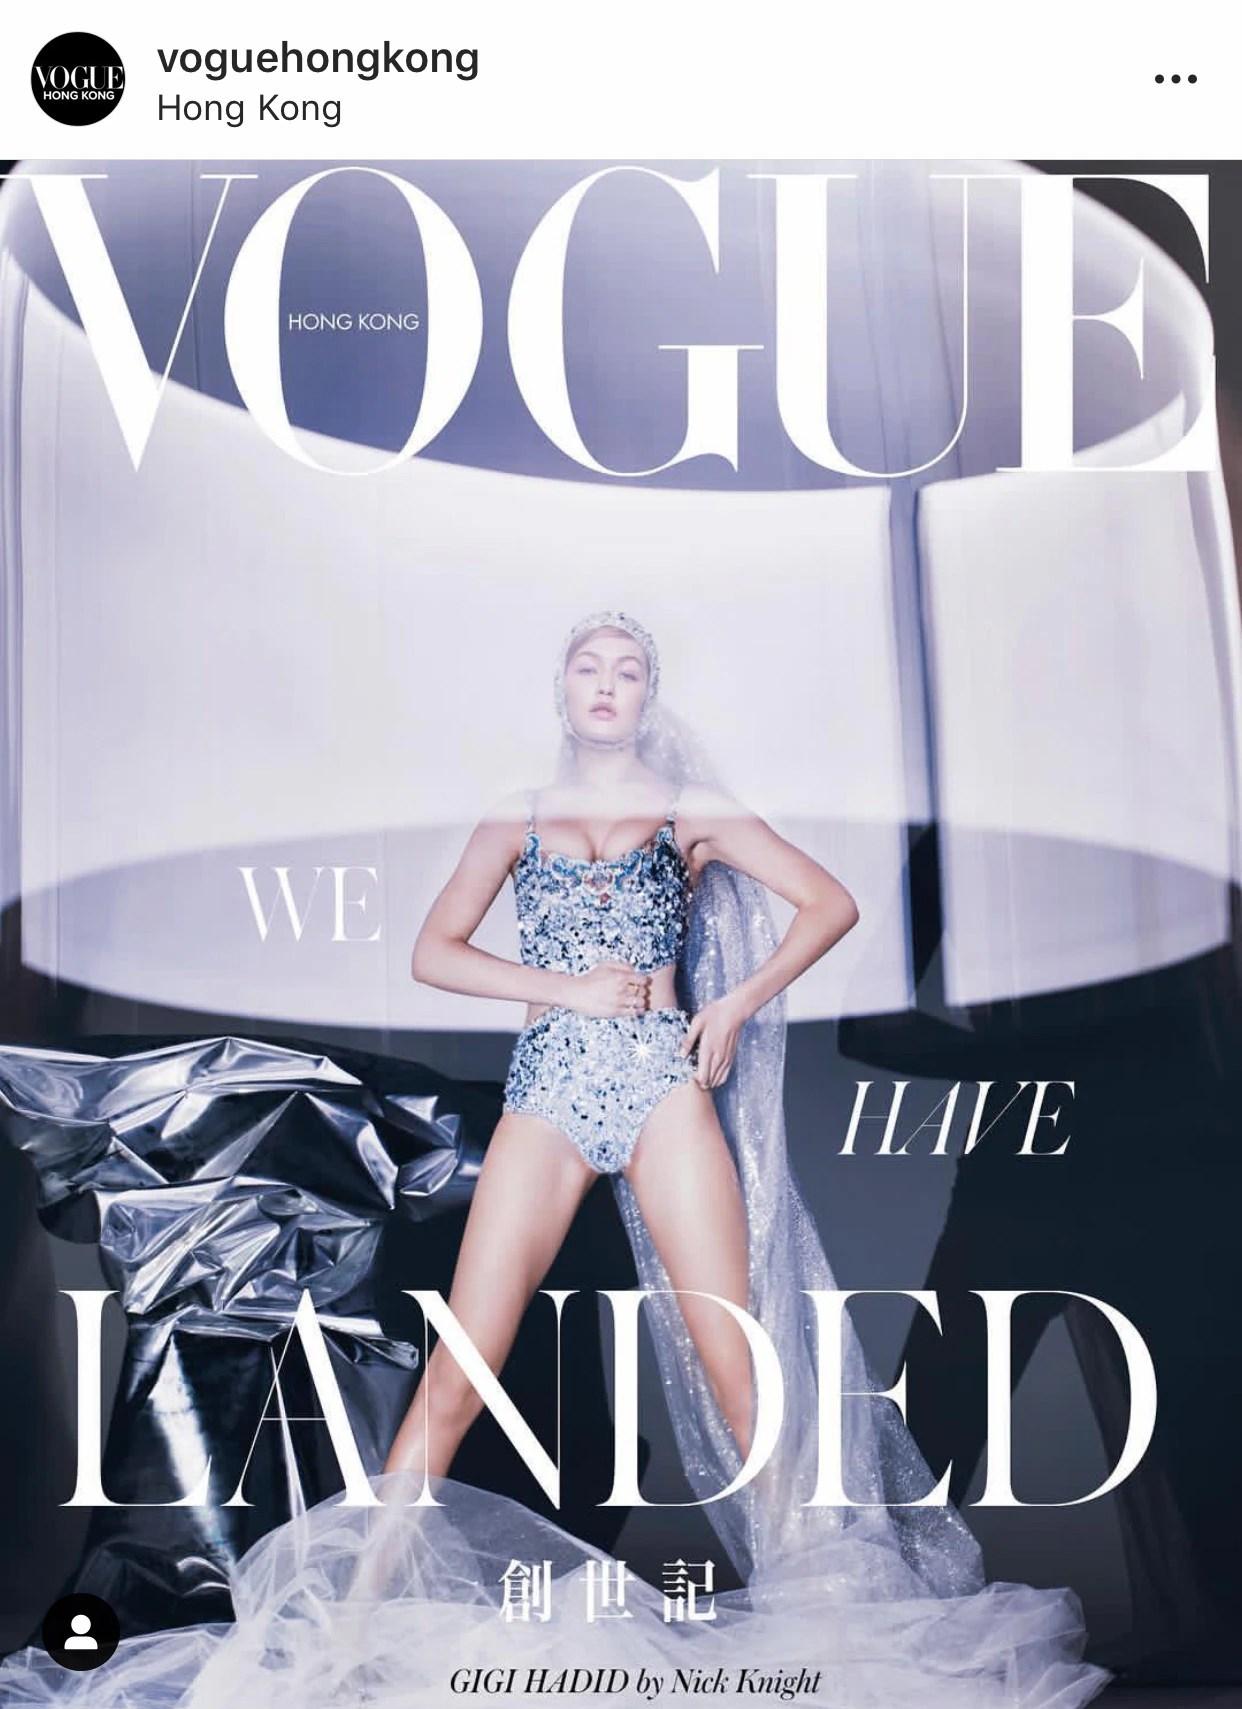 Gigi Hadid's New Vogue Cover Draws Ire in Hong Kong   E! News